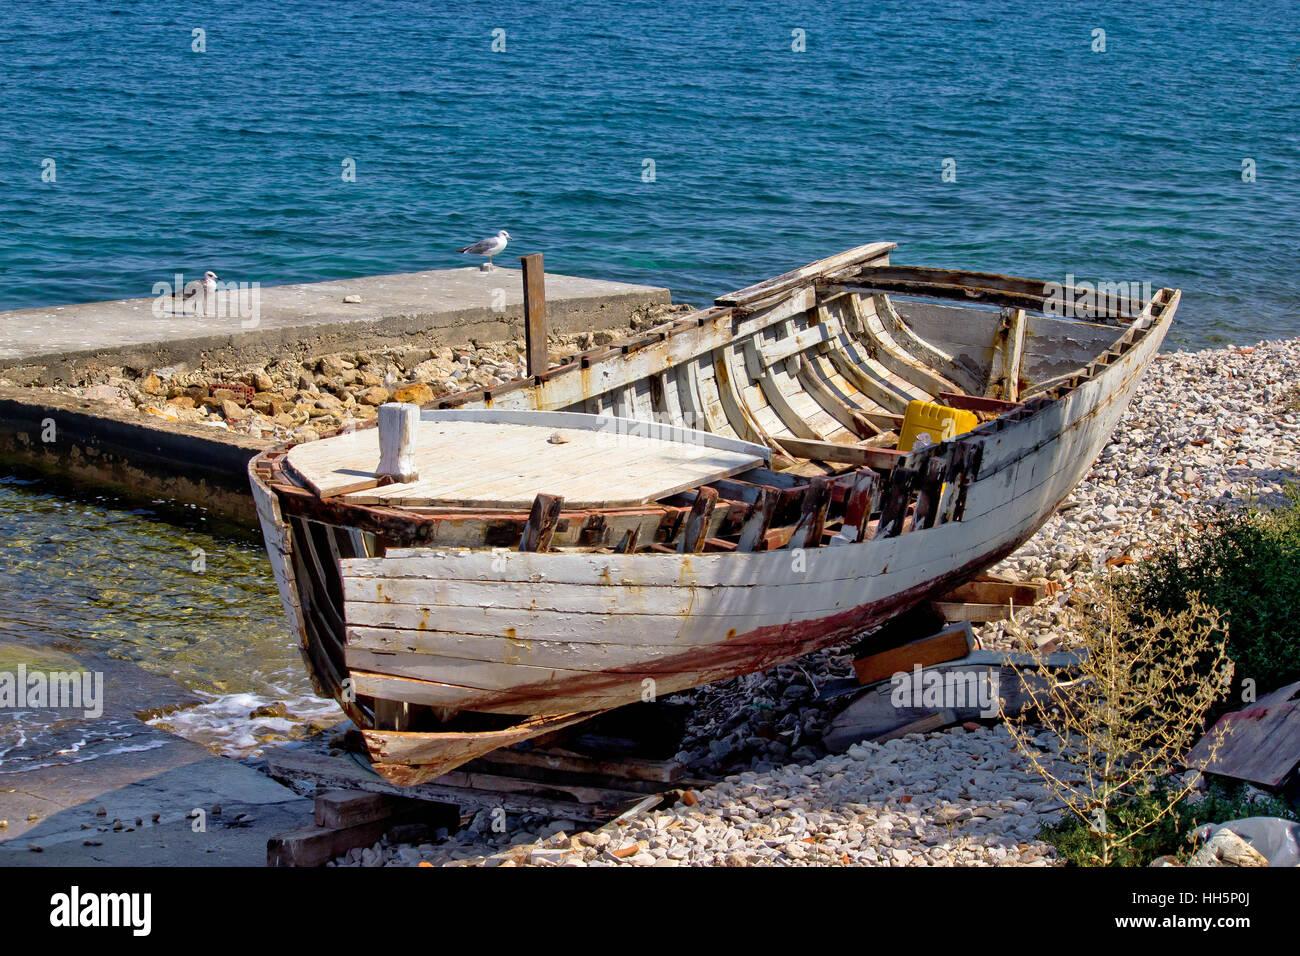 Old wooden boat broken by the sea, Dalmatian coast, Croatia Stock Photo